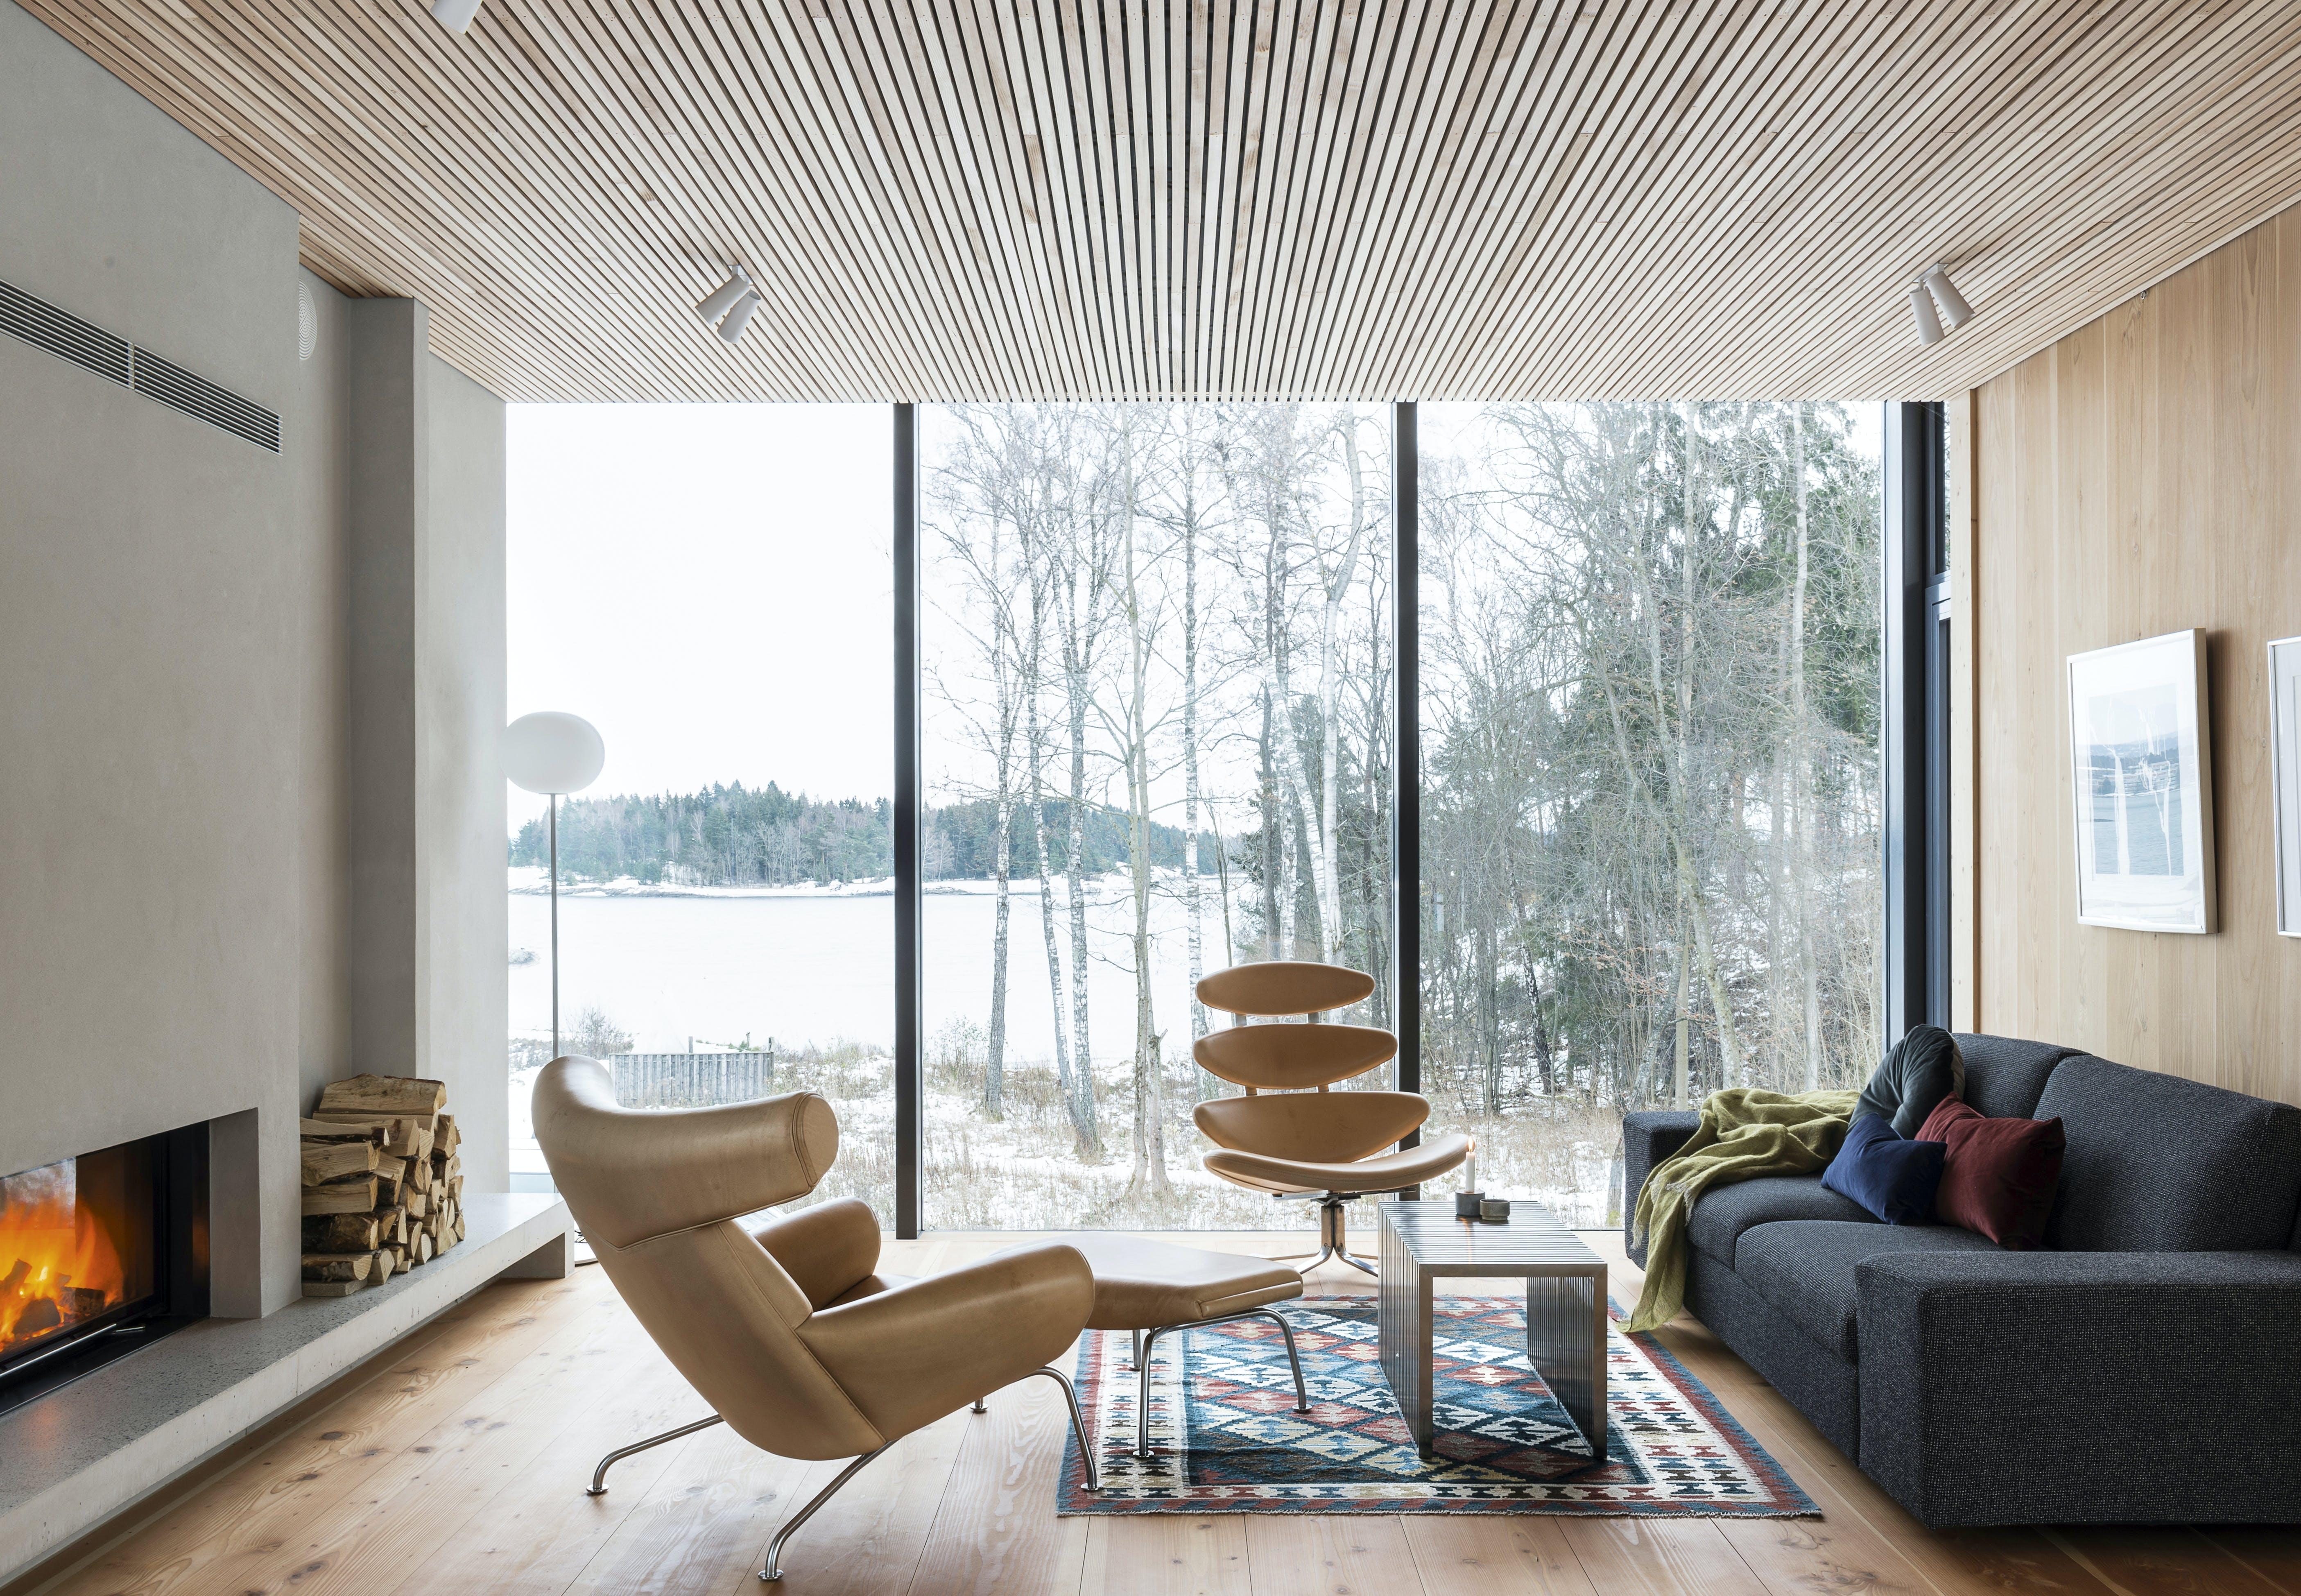 stue indretning udsigt vinduer Ox Chair Volthers Coronastol Erik Jørgensen